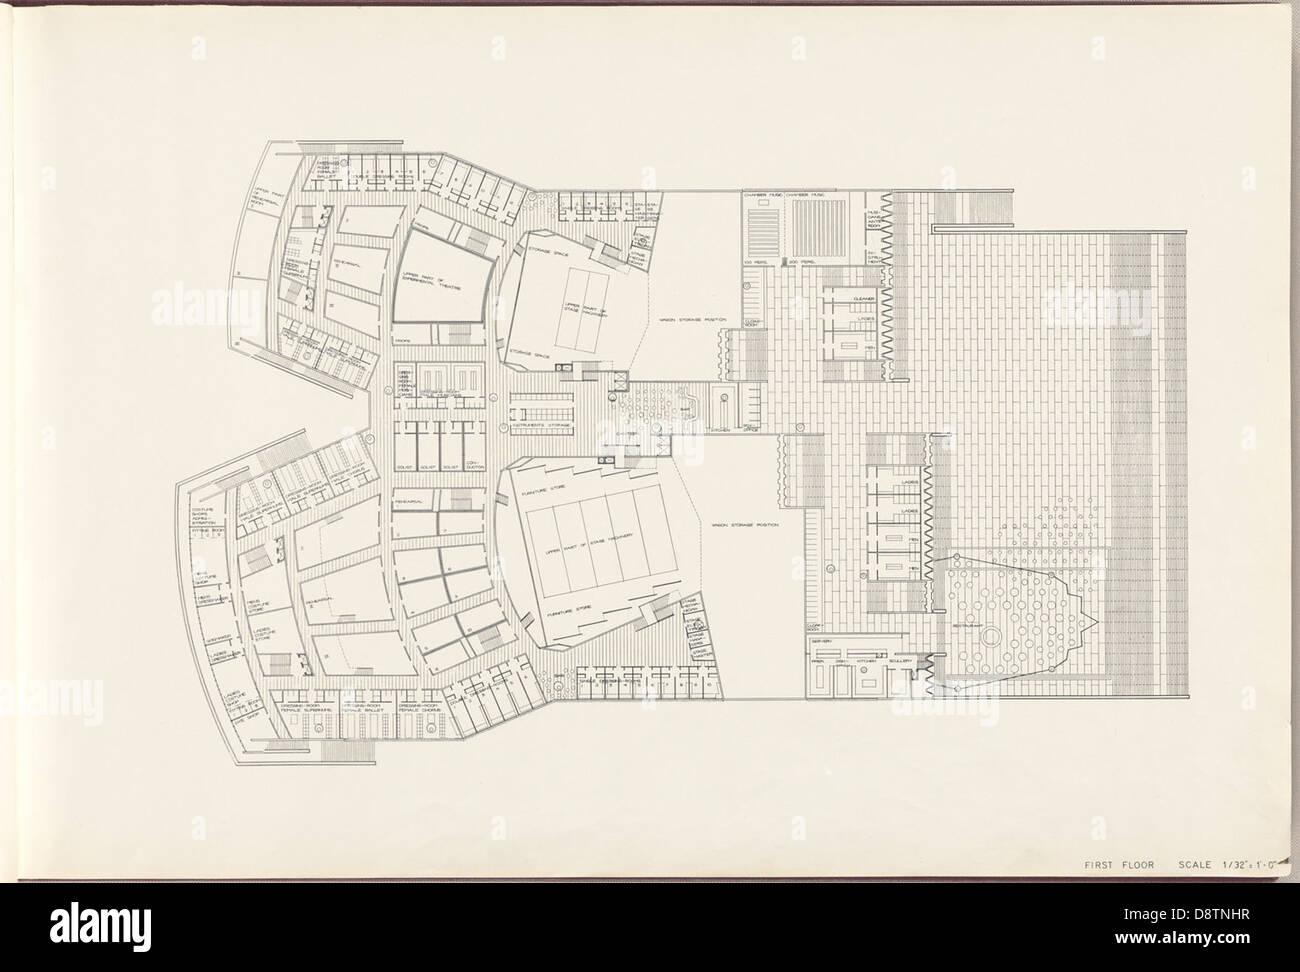 First floor plan sydney opera house stock photo 57092163 for Stock floor plans